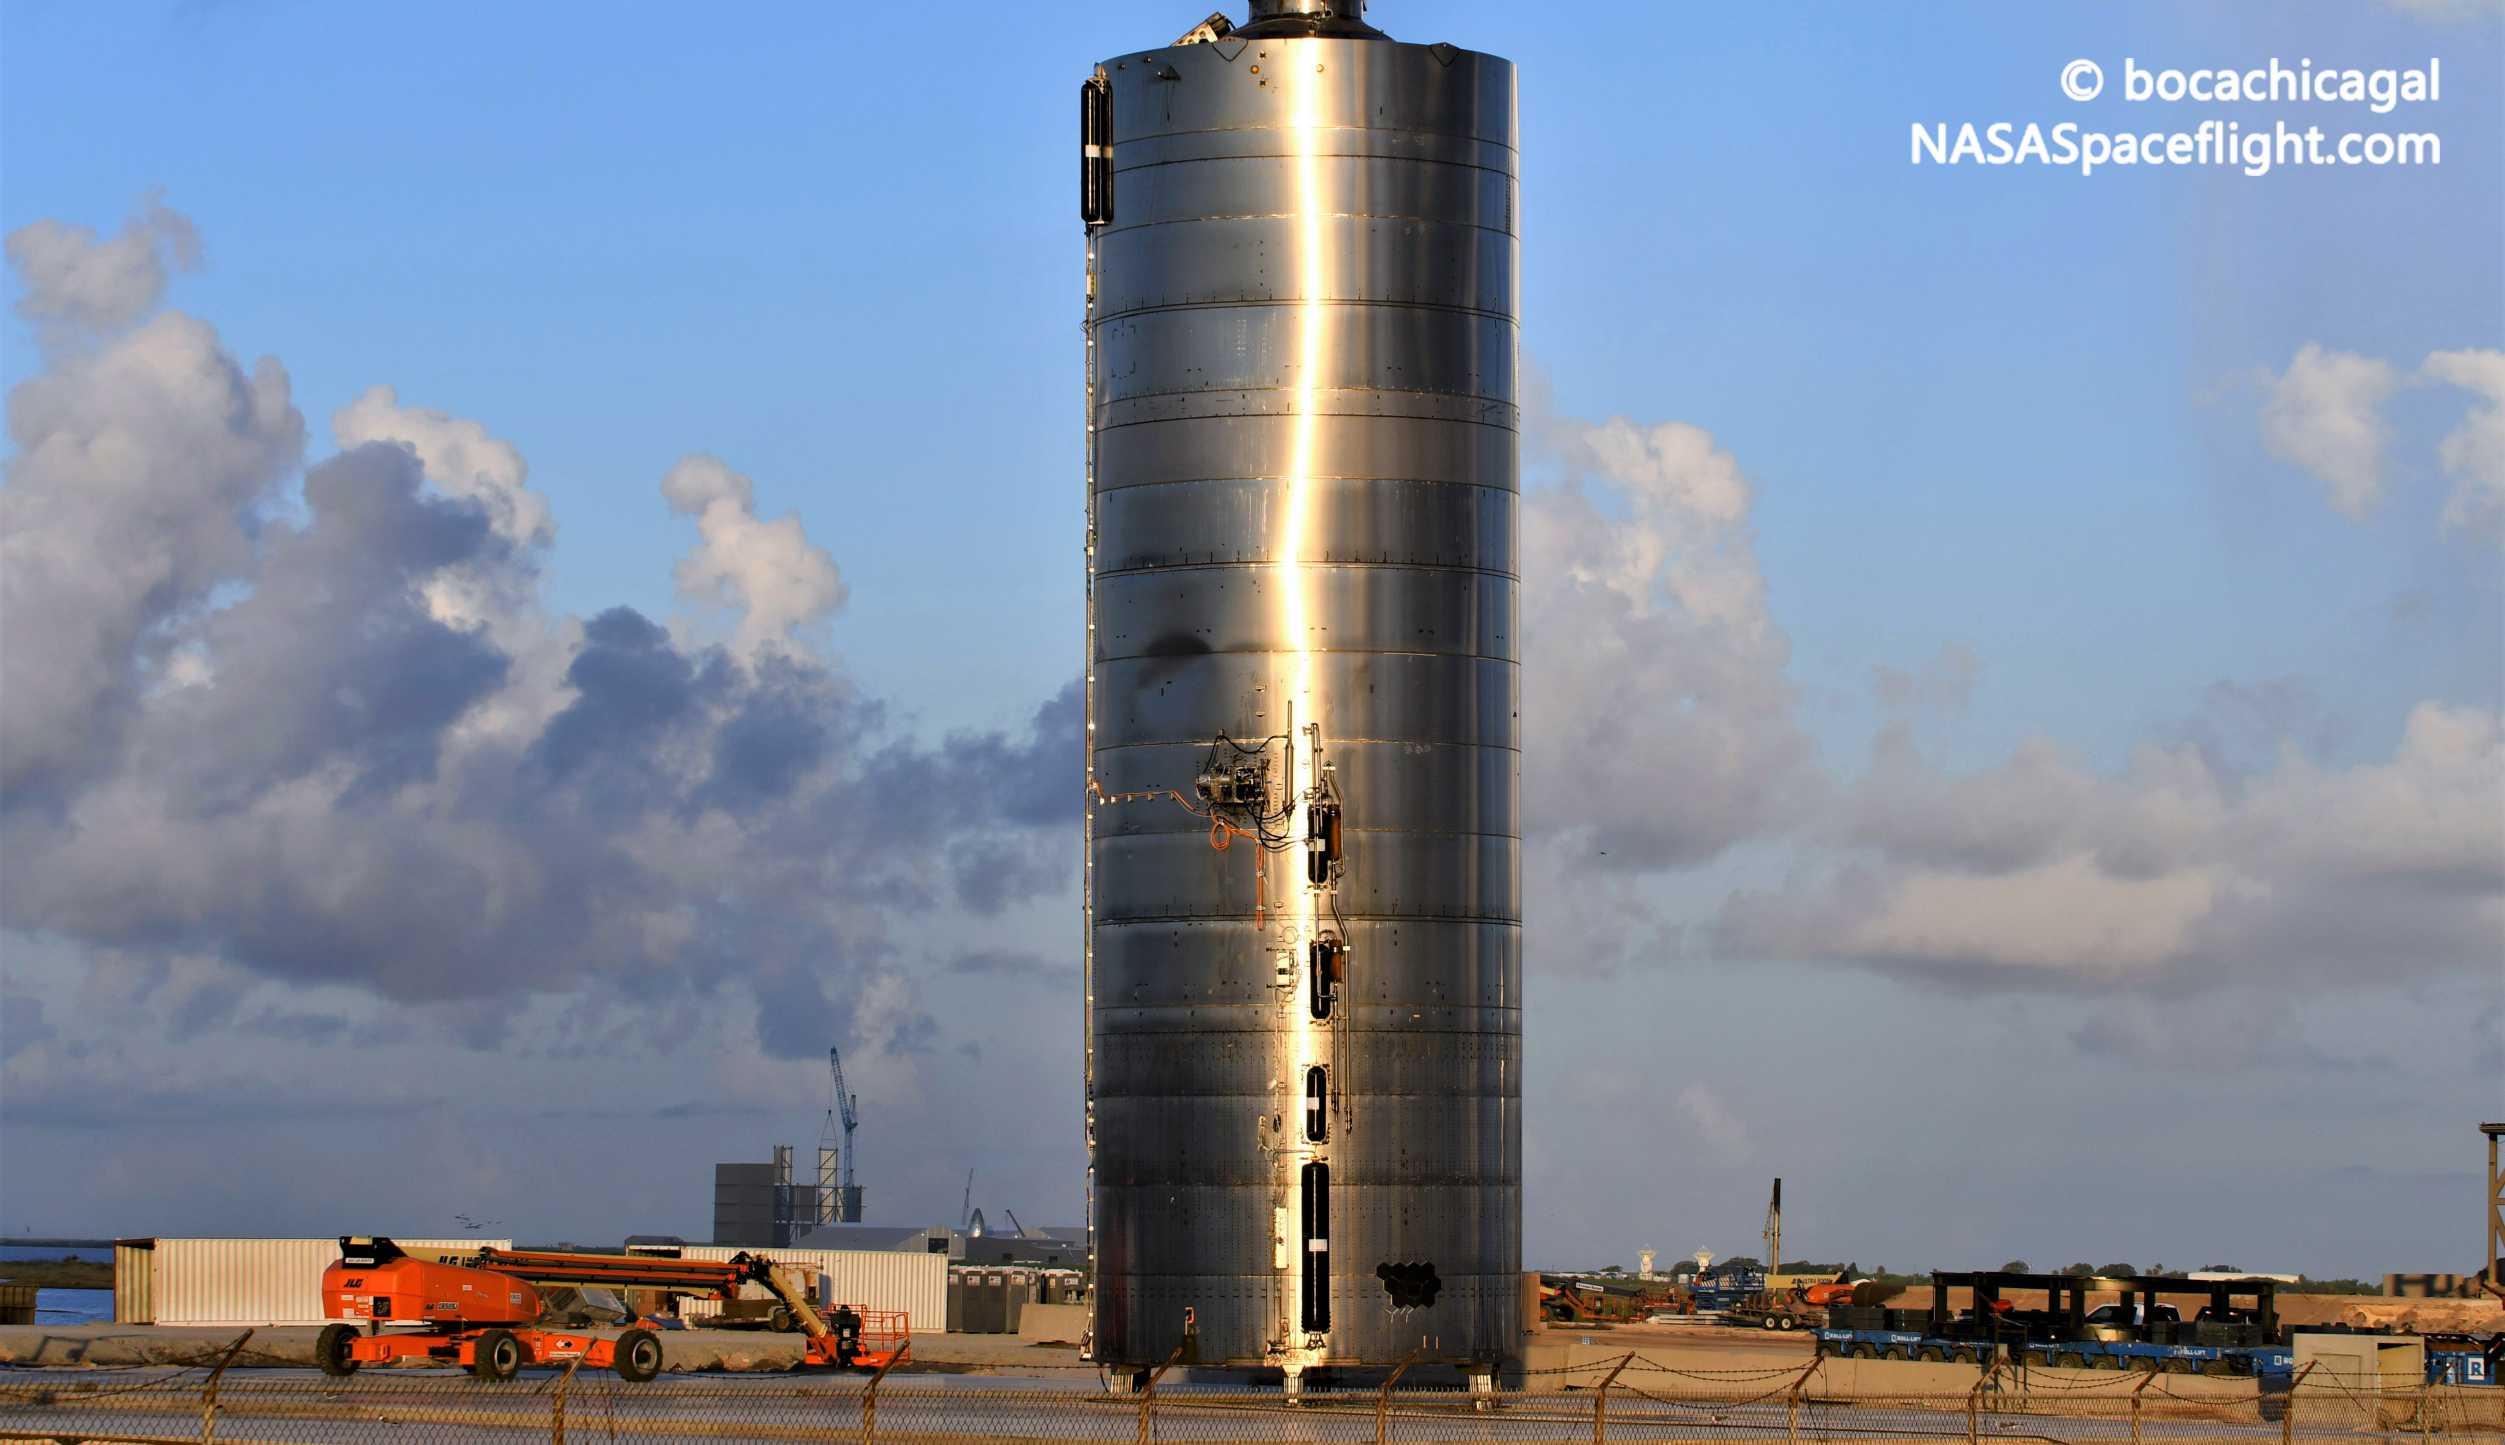 Starship Boca Chica 080720 (NASASpaceflight – bocachicagal) SN5 post hop 2 crop (c)